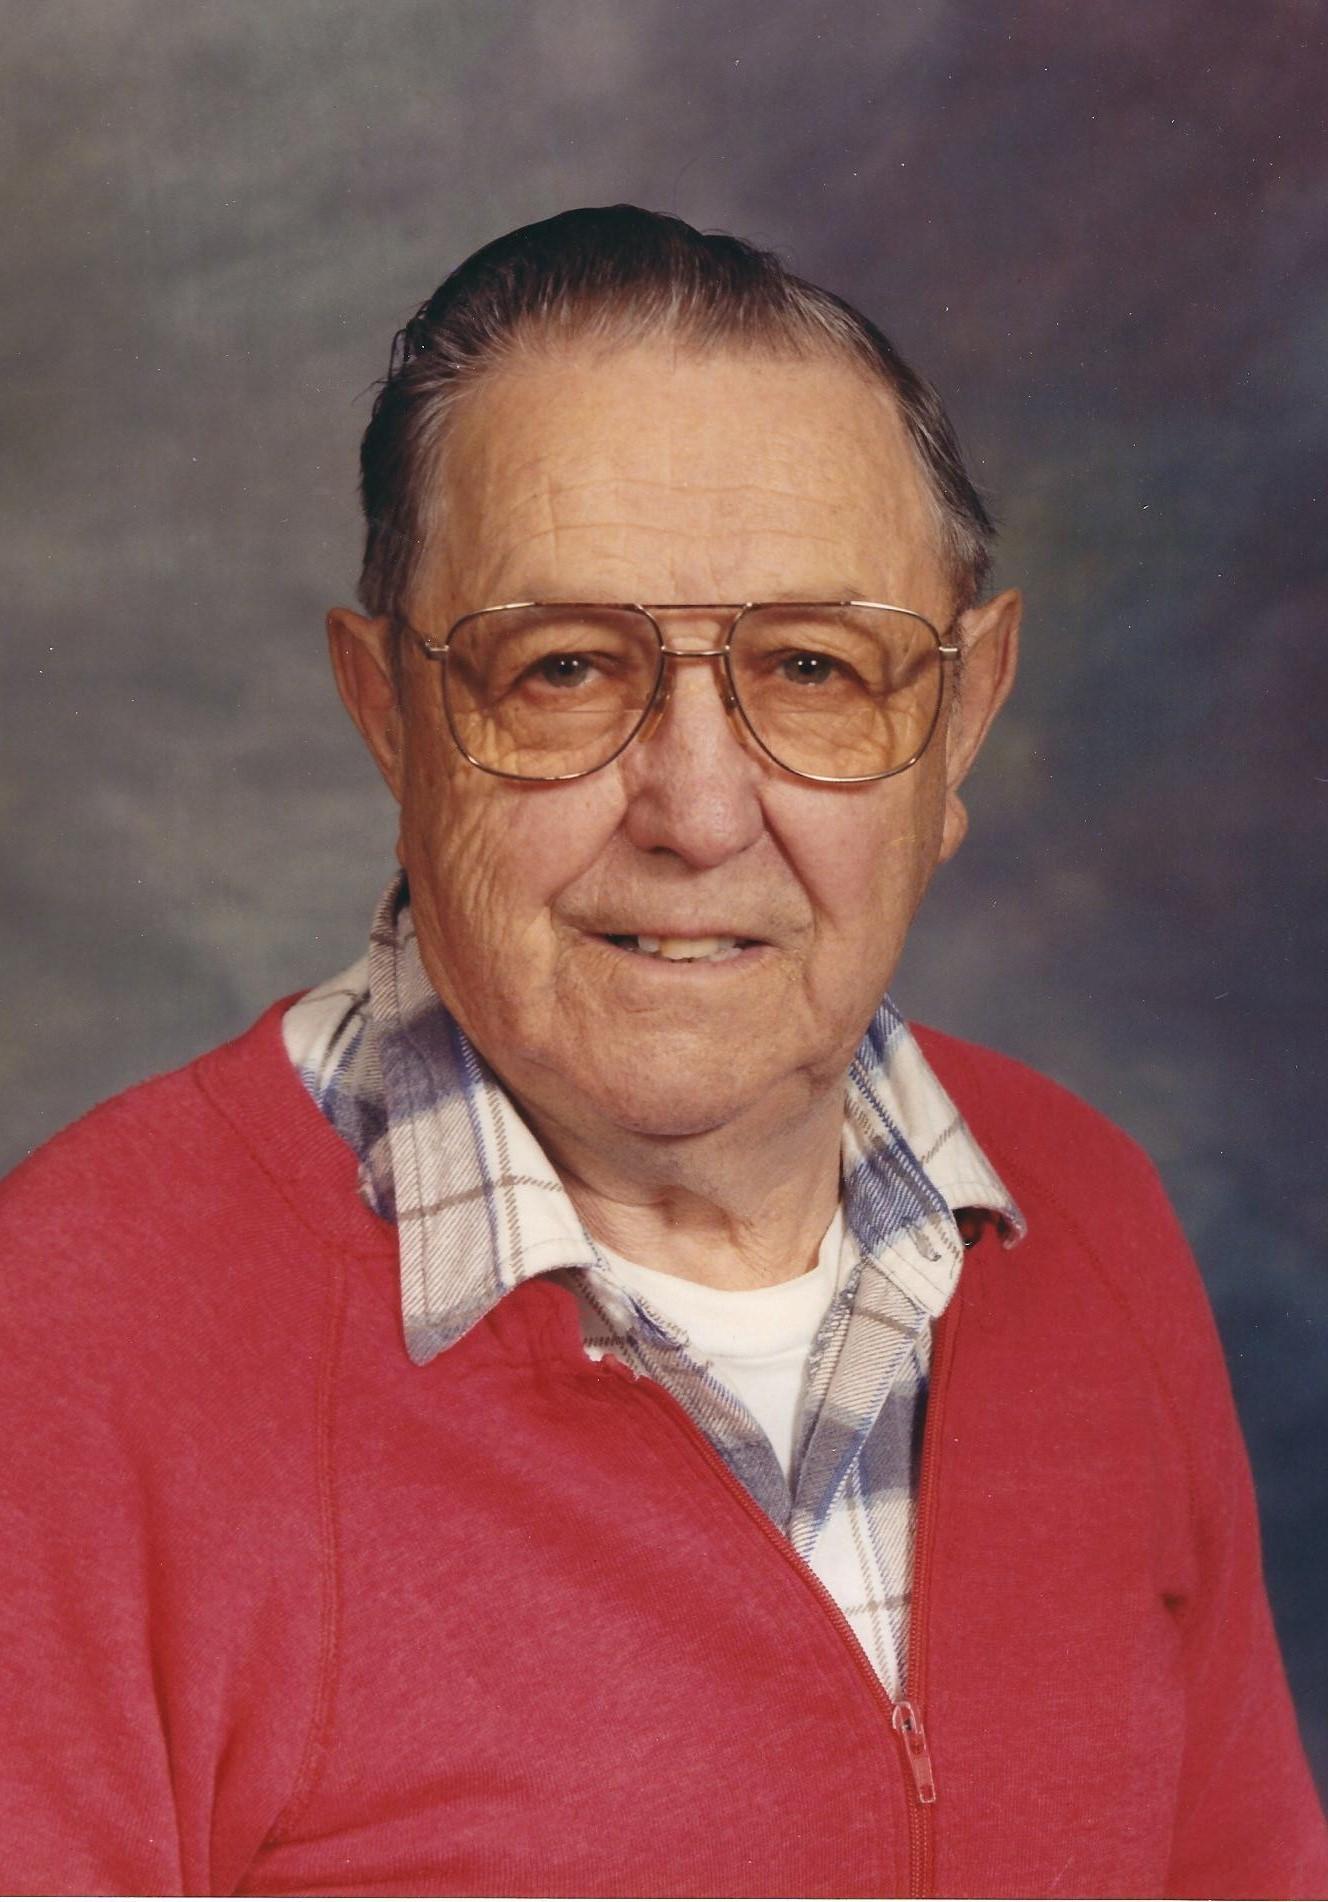 Harold R. Bresher